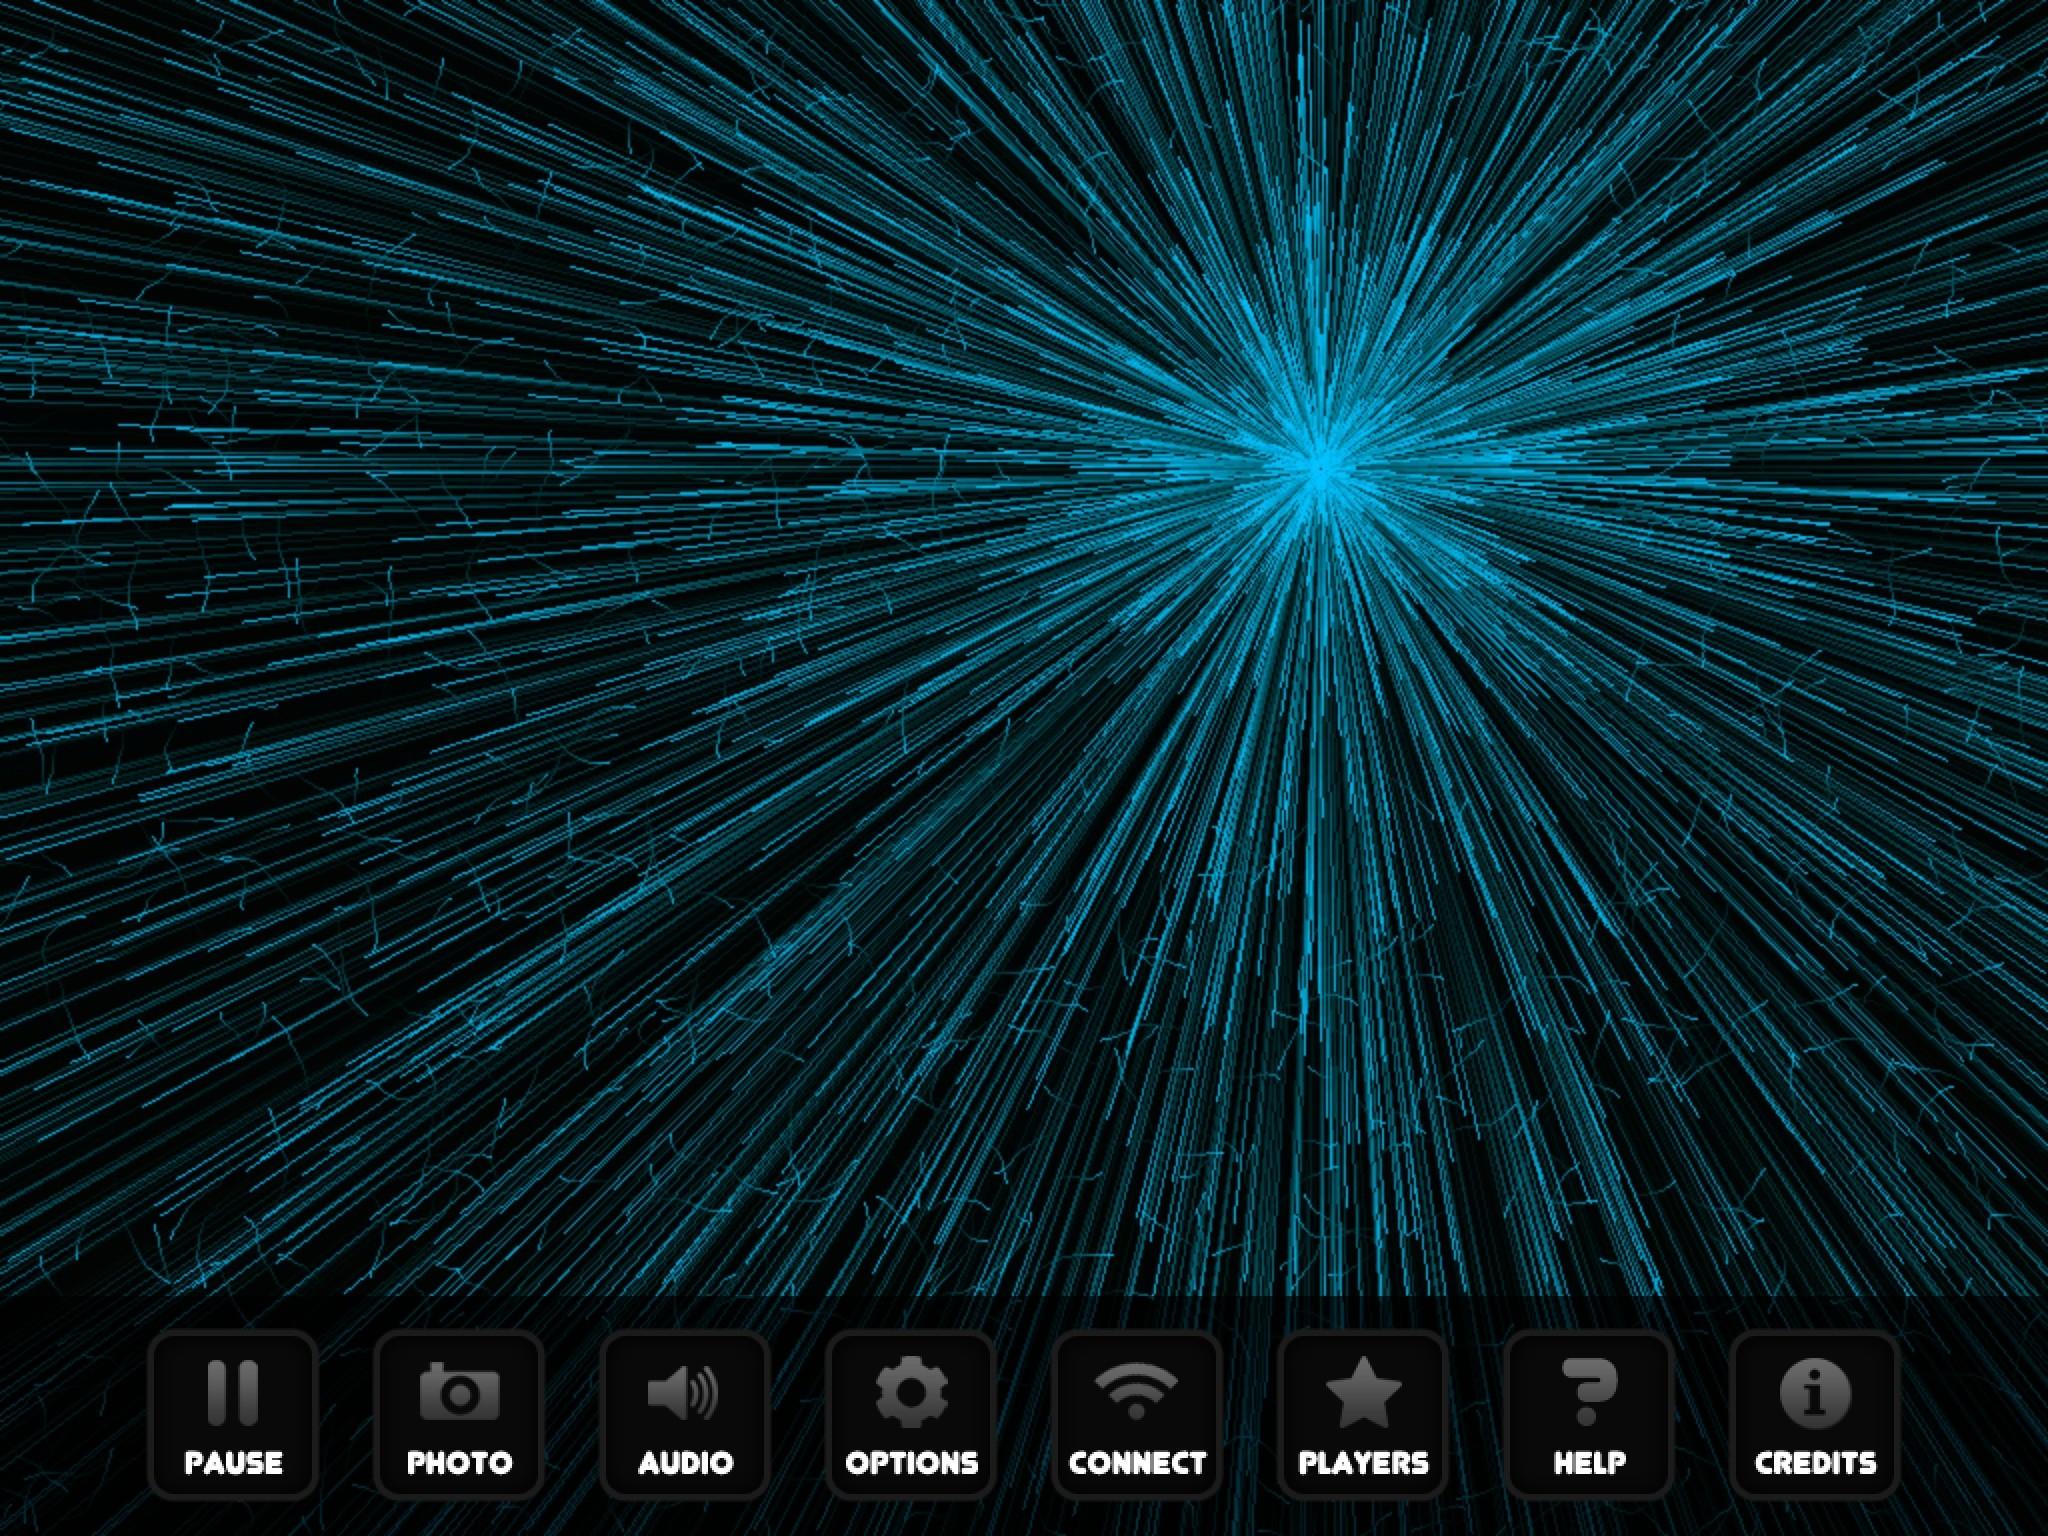 Particle Physics Wallpaper Gaming, and physics